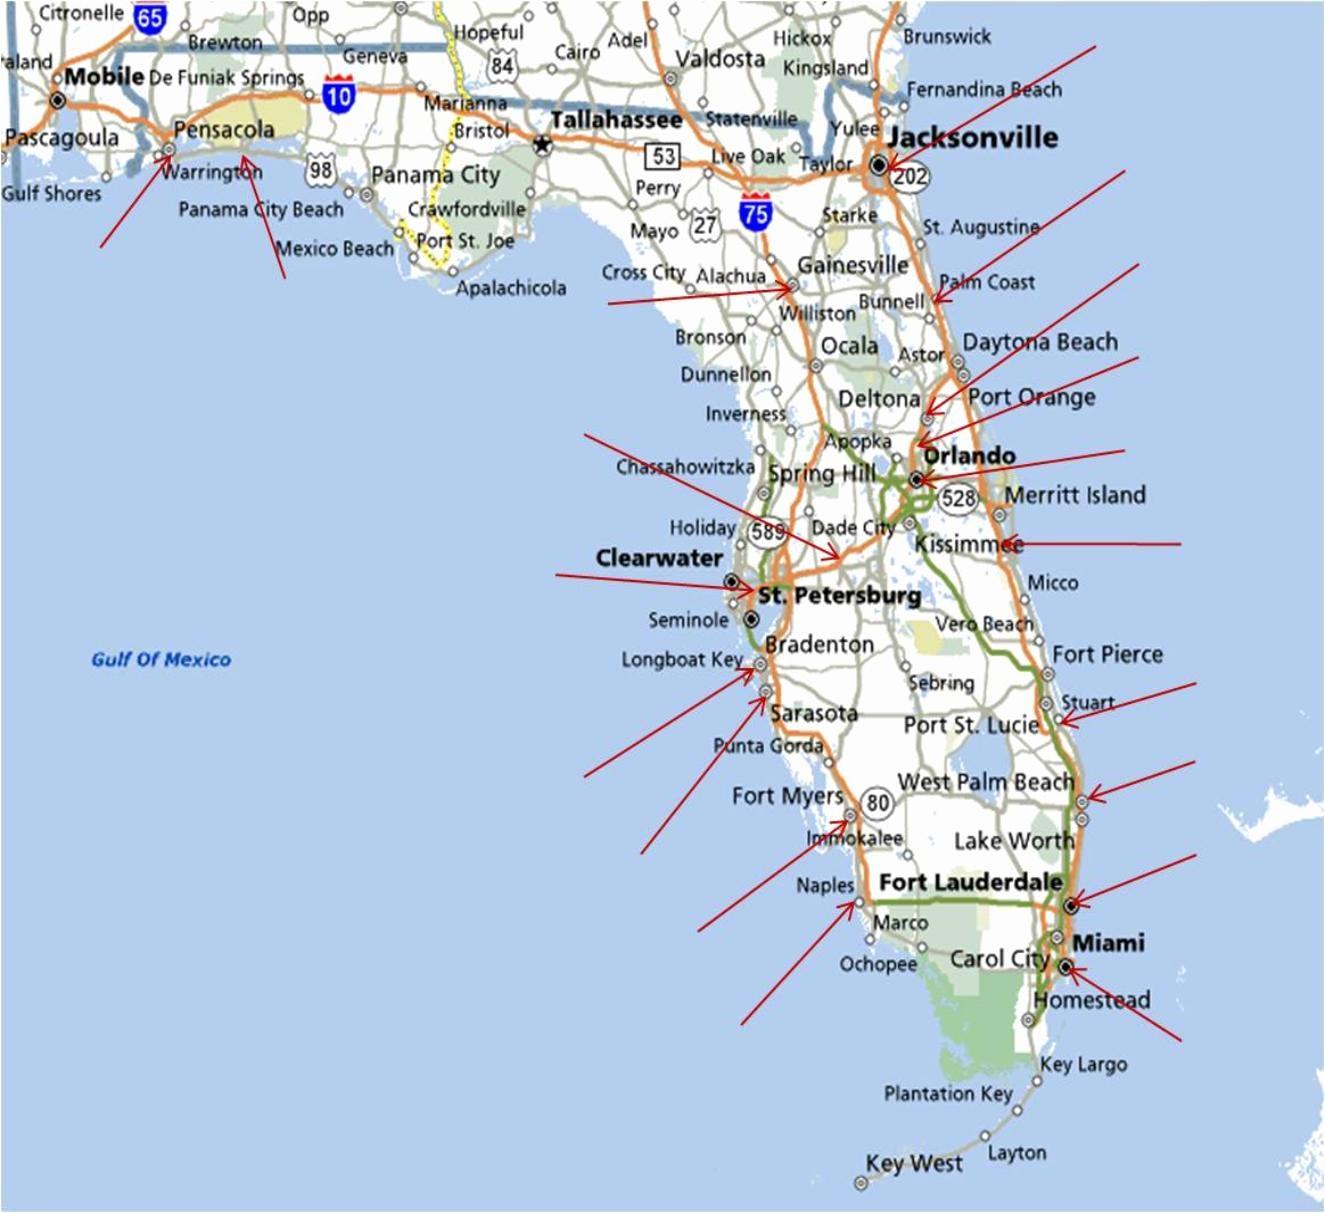 Best East Coast Florida Beaches New Map Florida West Coast Florida - Treasure Coast Florida Map